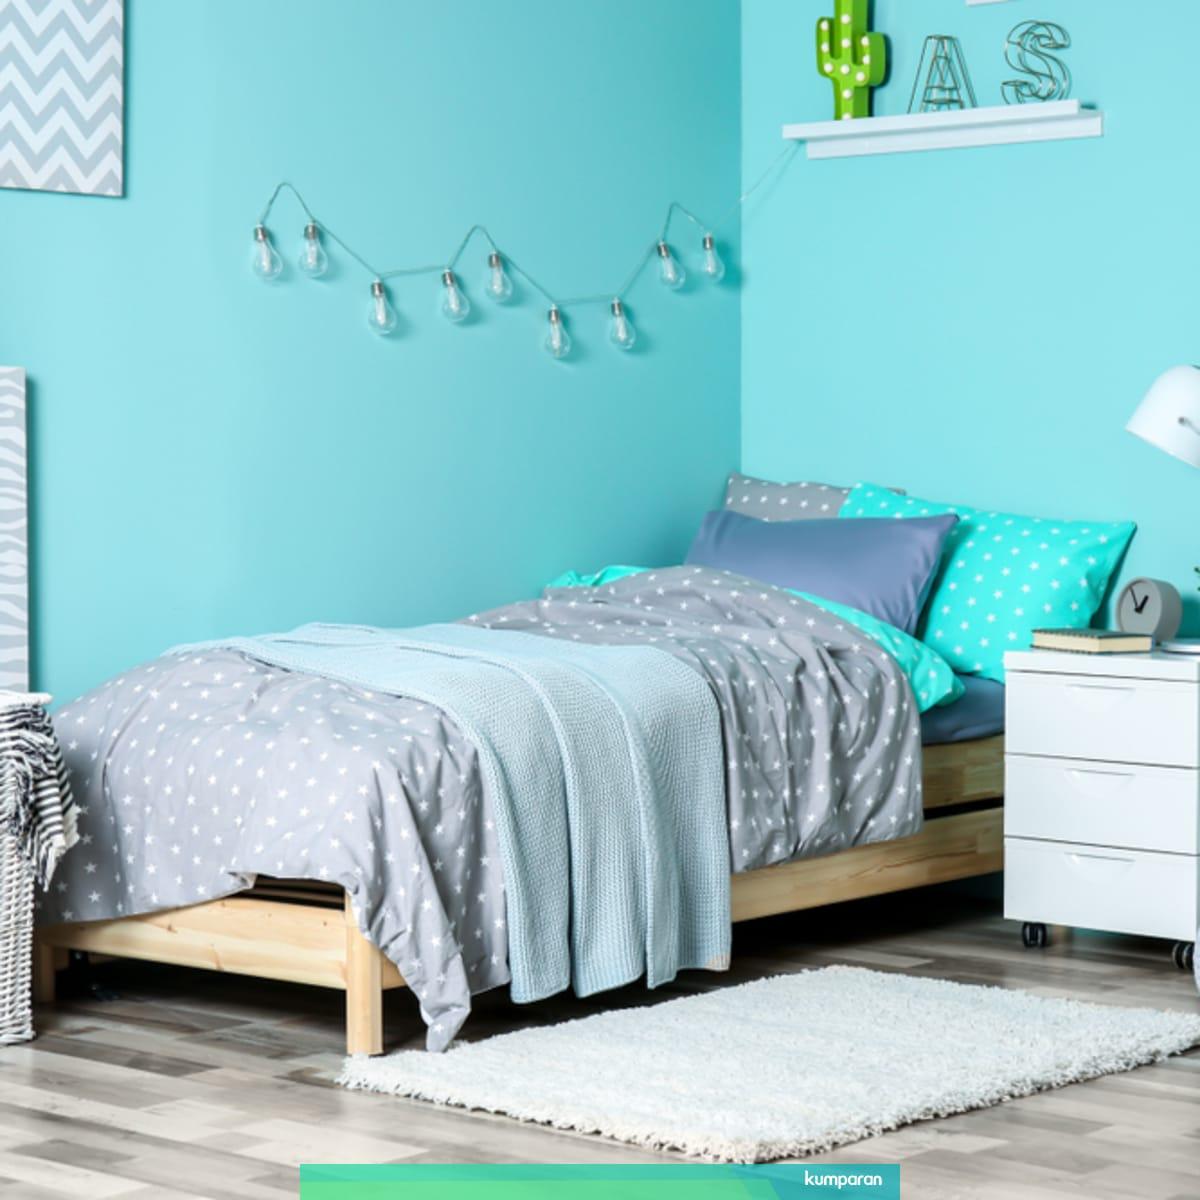 5 Tips Dekorasi Kamar Tidur Berukuran Kecil Agar Terlihat Lebih Luas Kumparan Com